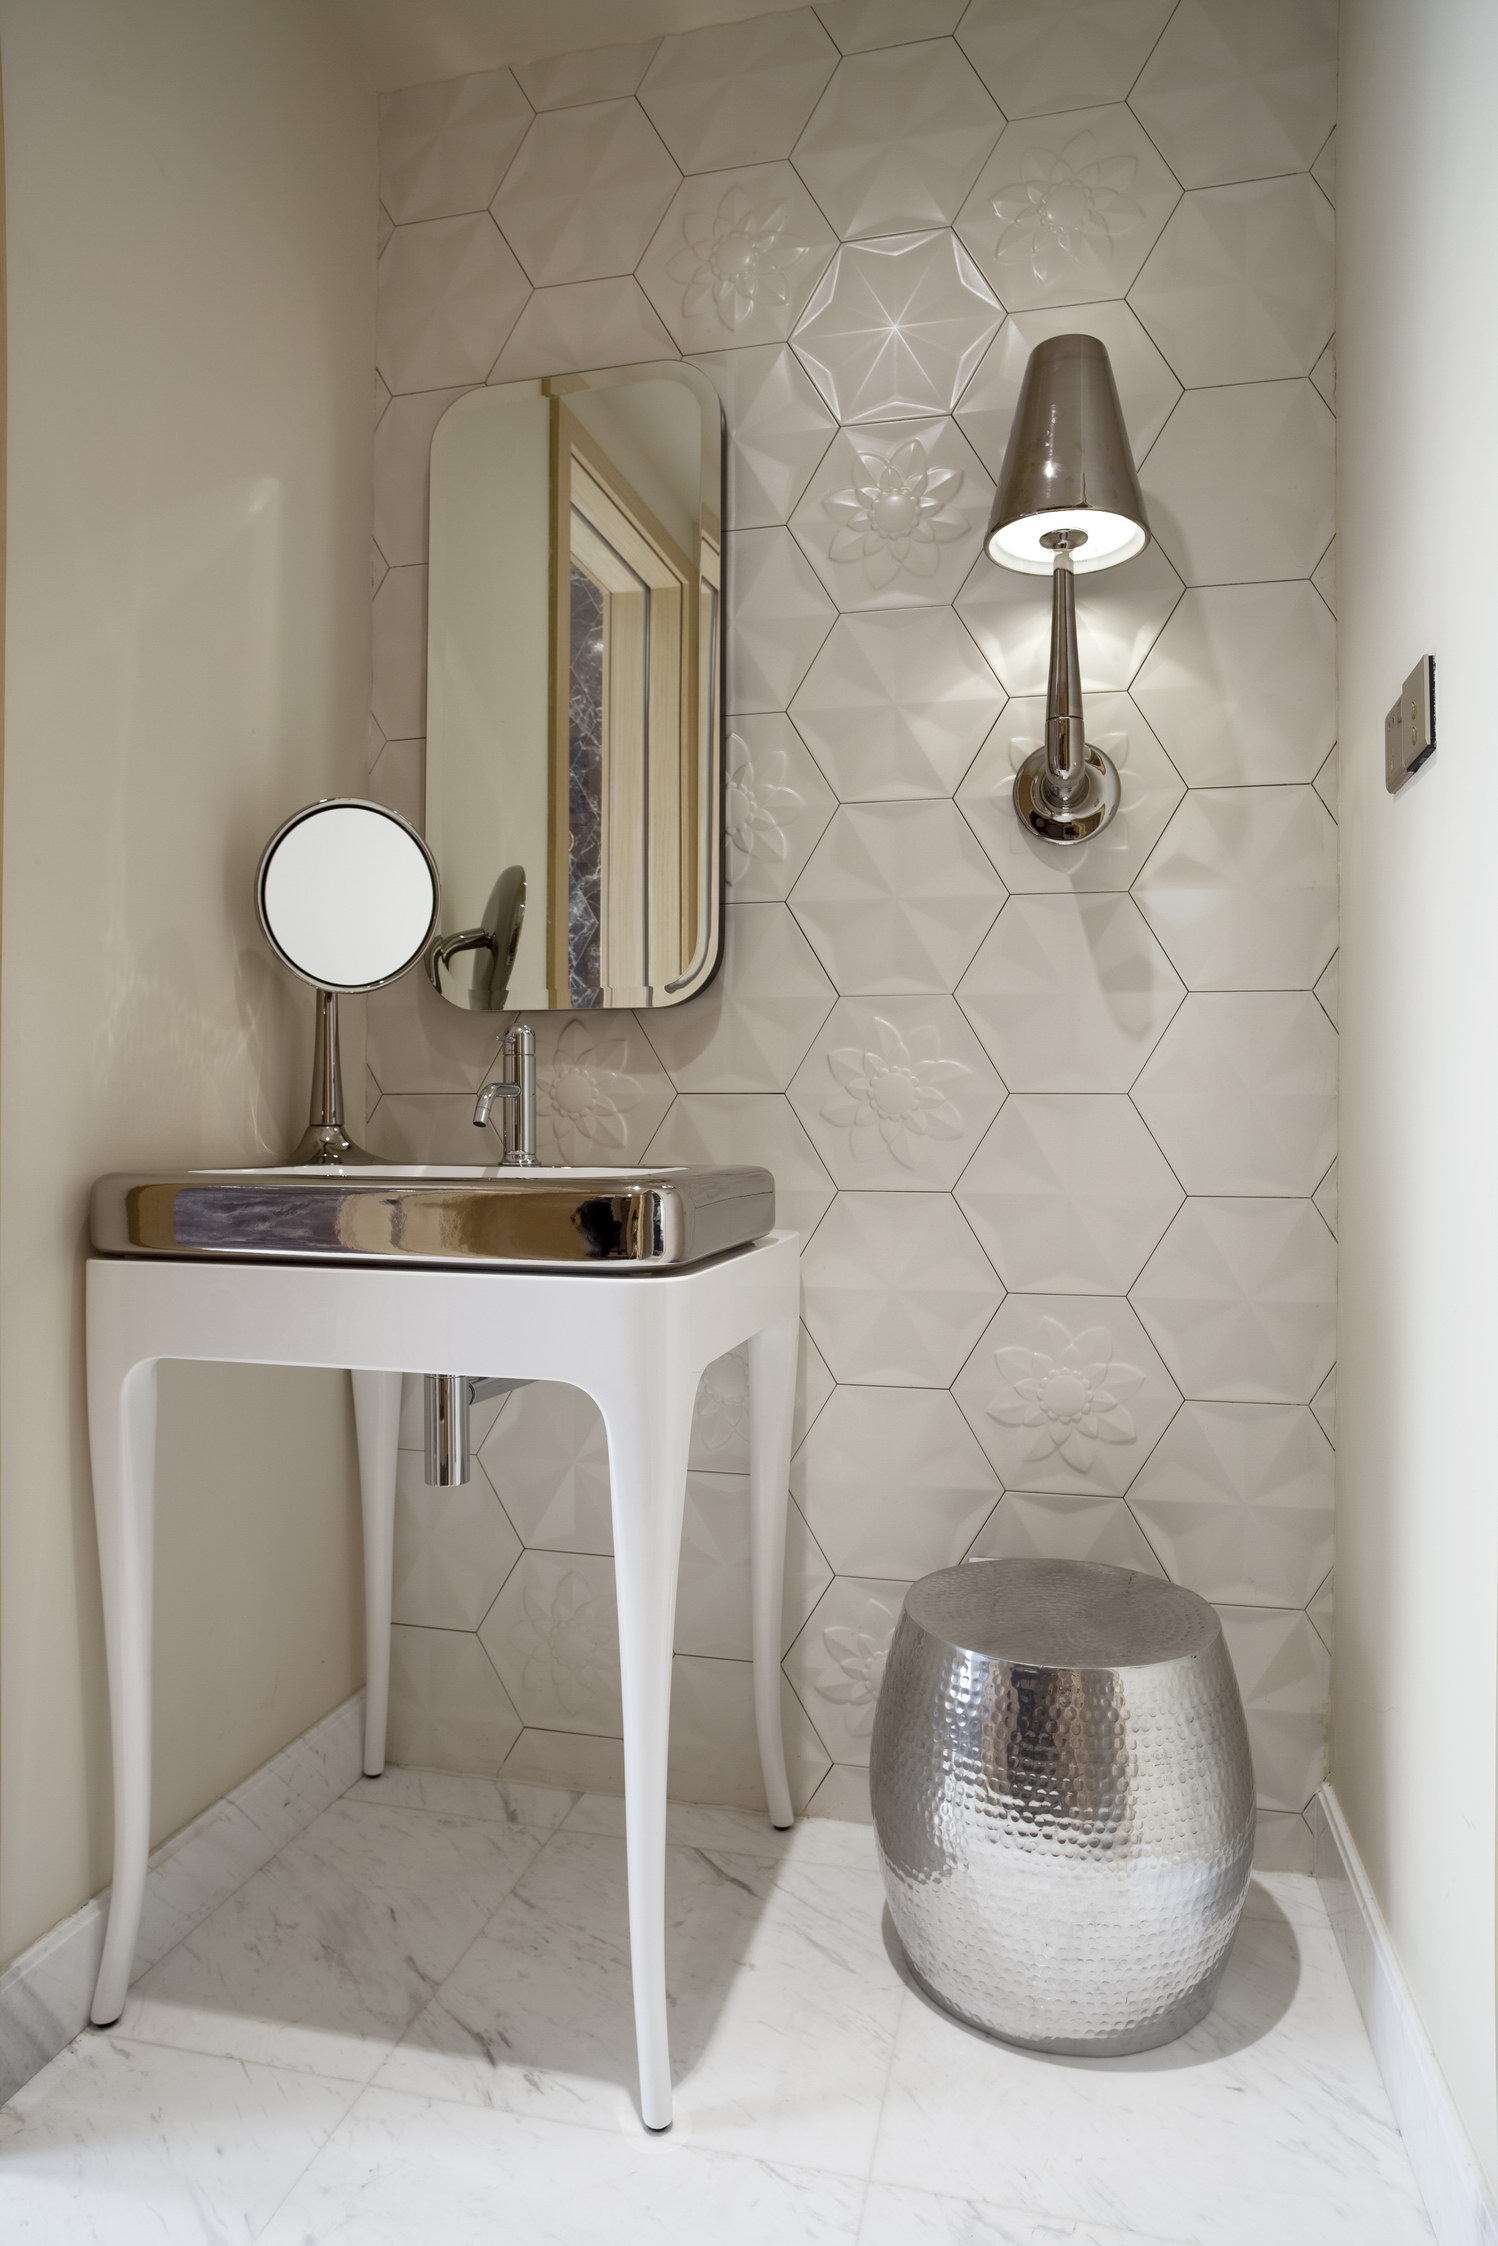 BATHROOM Bisazza platinum sink and black cabinet by Hayon for Bisazza